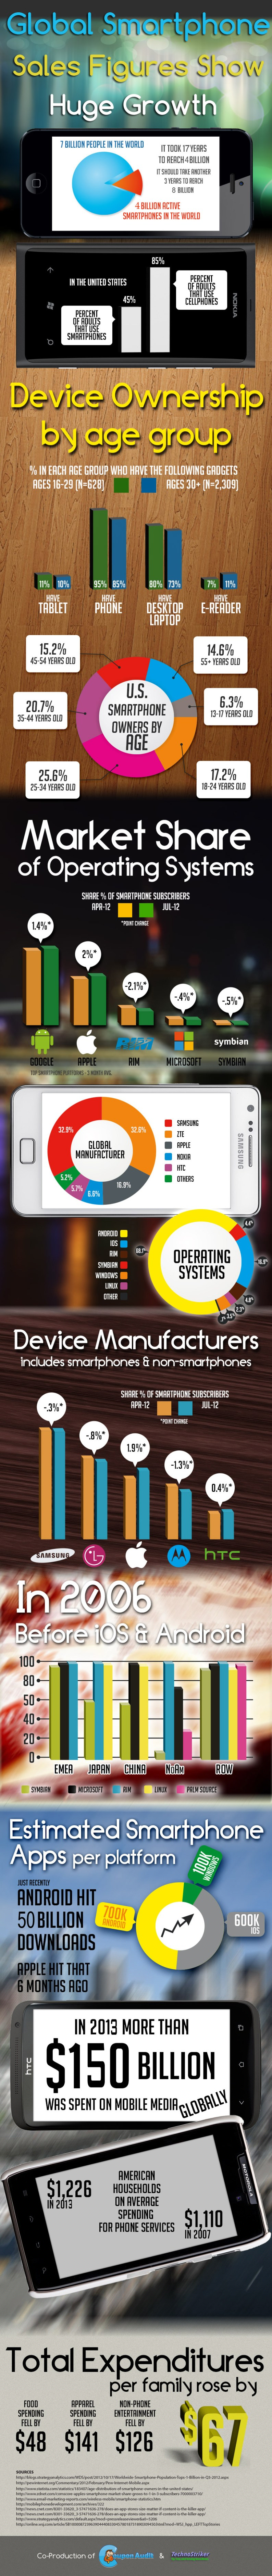 Global Smartphone Sales Figures Show Huge Growth